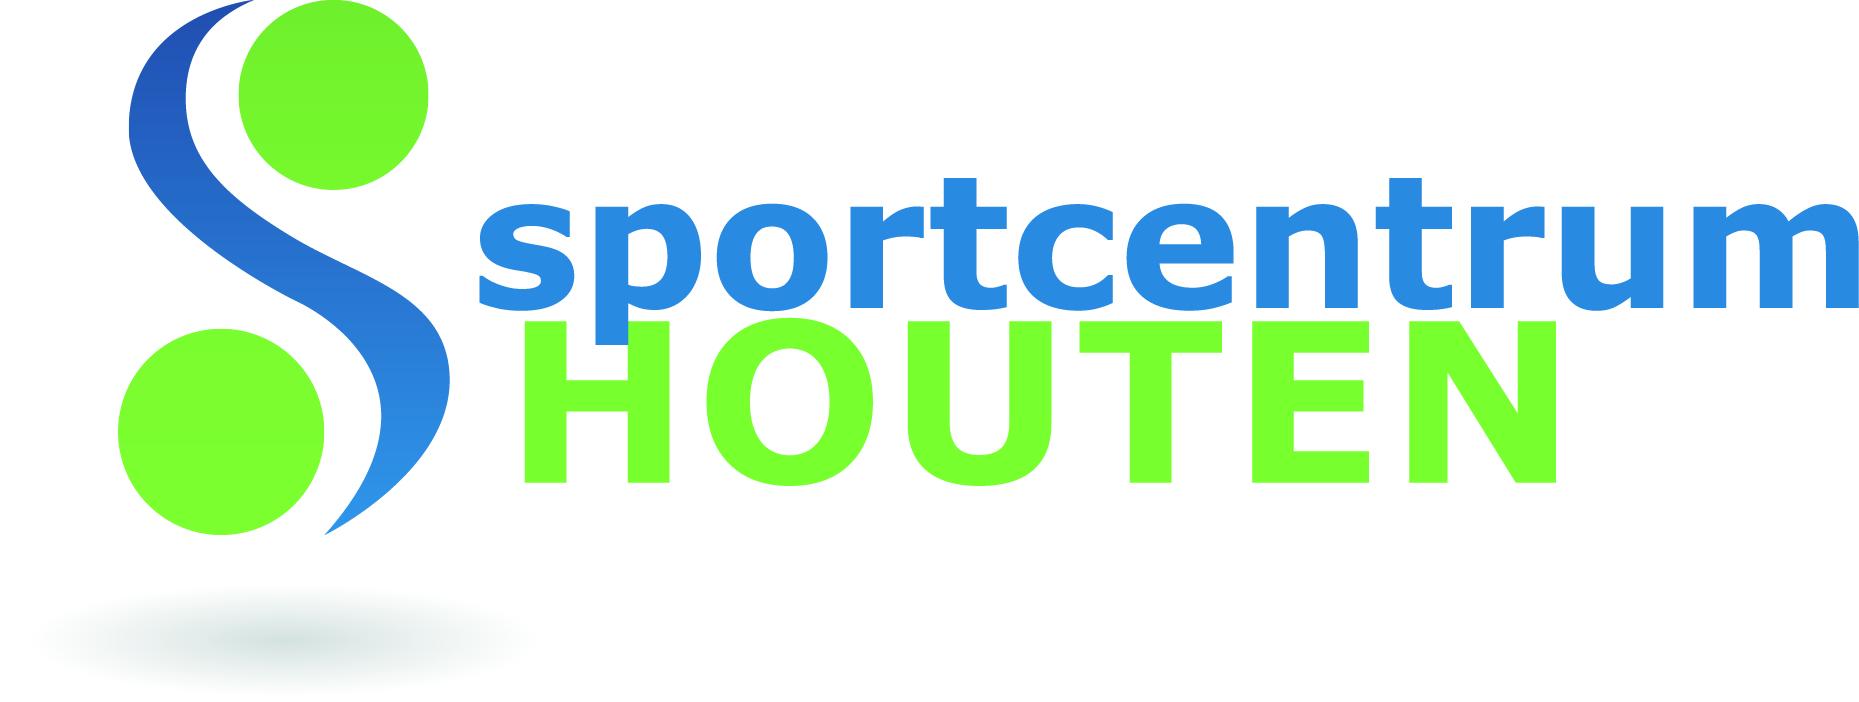 Sportcentrum Houten